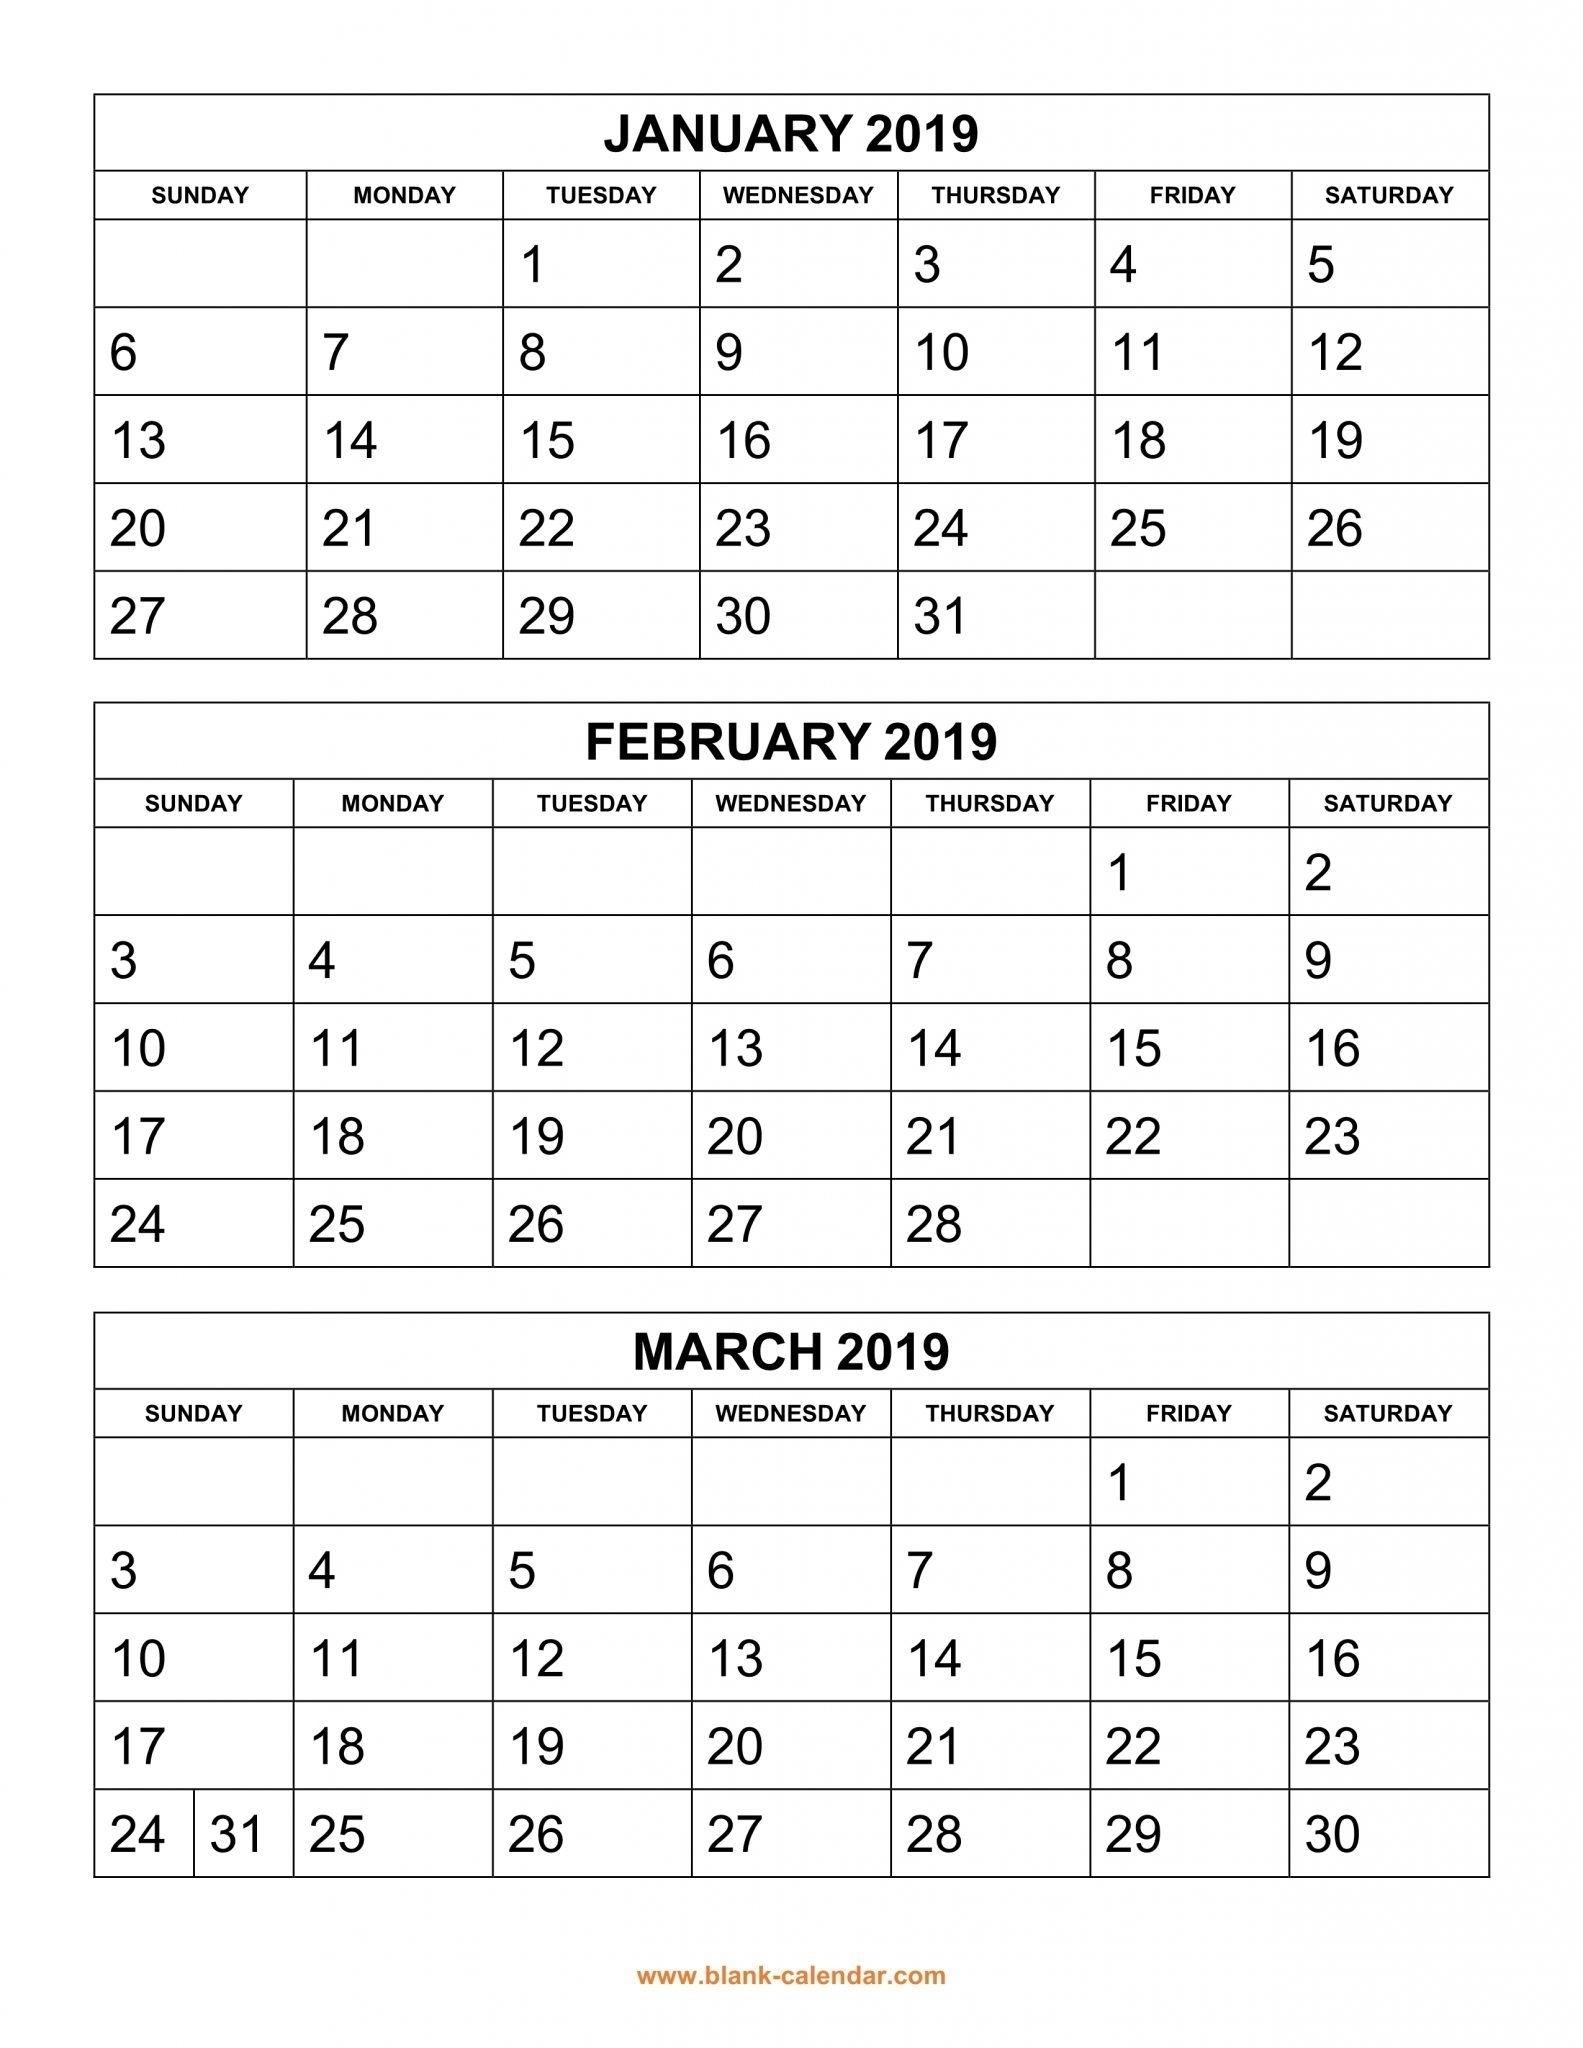 Get 3 Month Blank Calendar Template ⋆ The Best Printable Calendar Collection